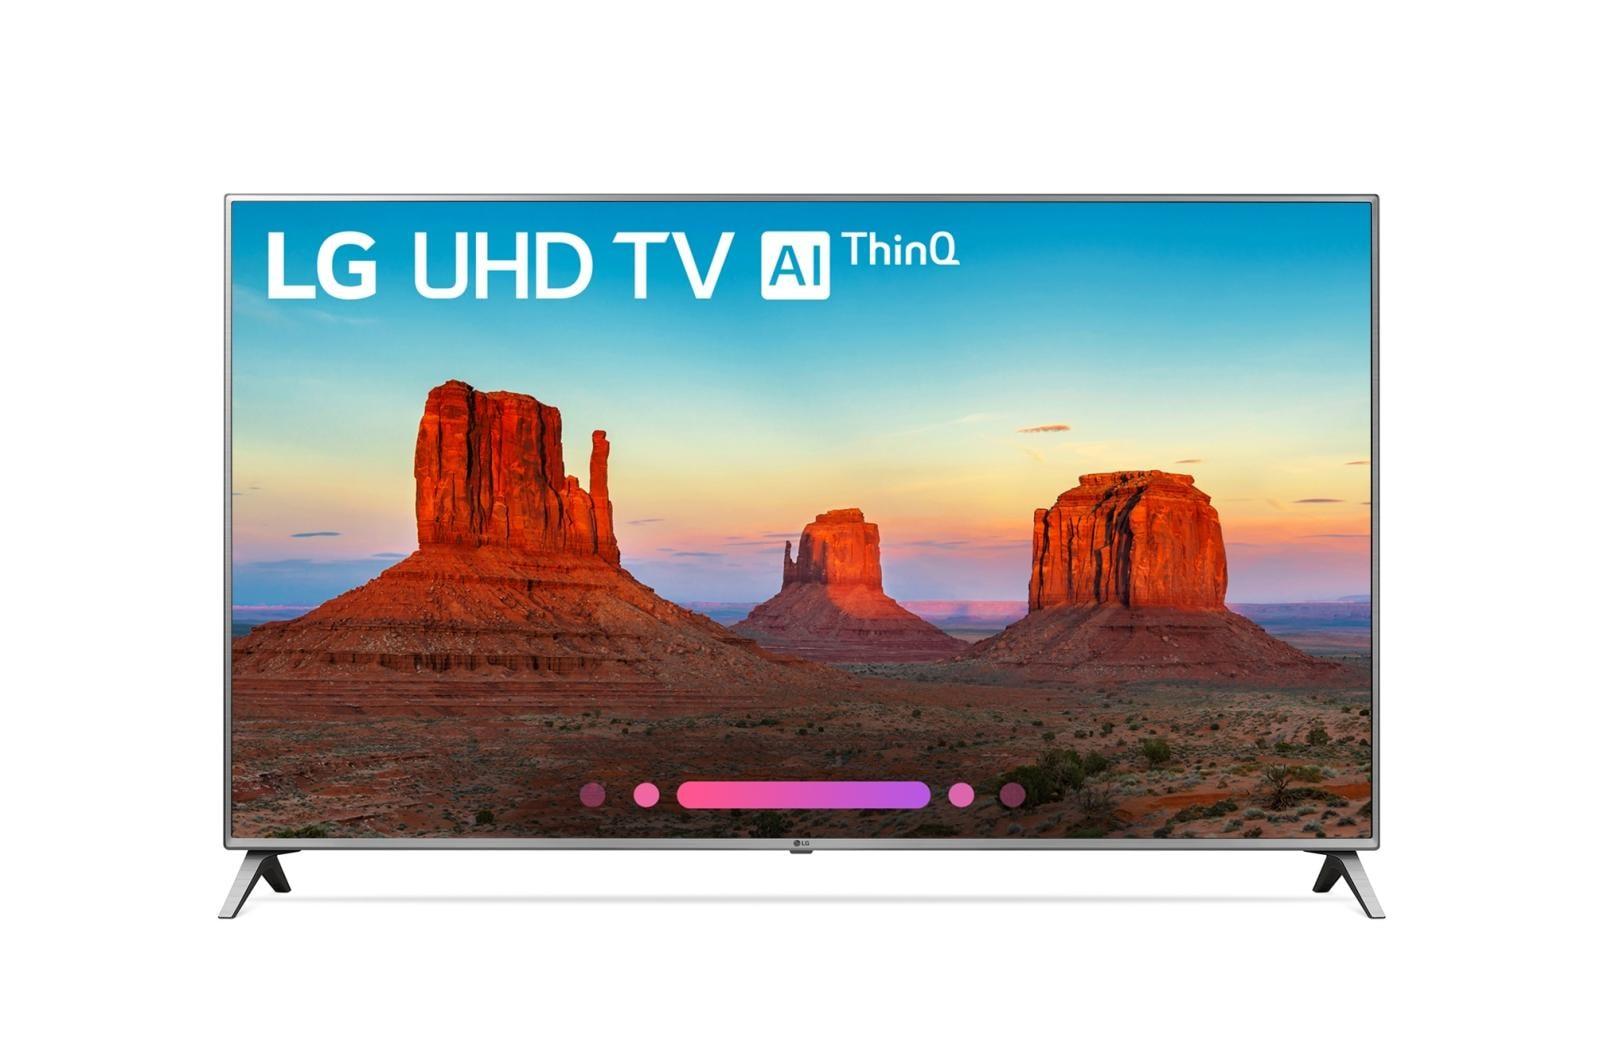 Lg 65uk6500aua 65 Inch Class 4k Hdr Smart Led Uhd Tv W Ai Thinq Telephone Wiring Colour Codes Uk Usa